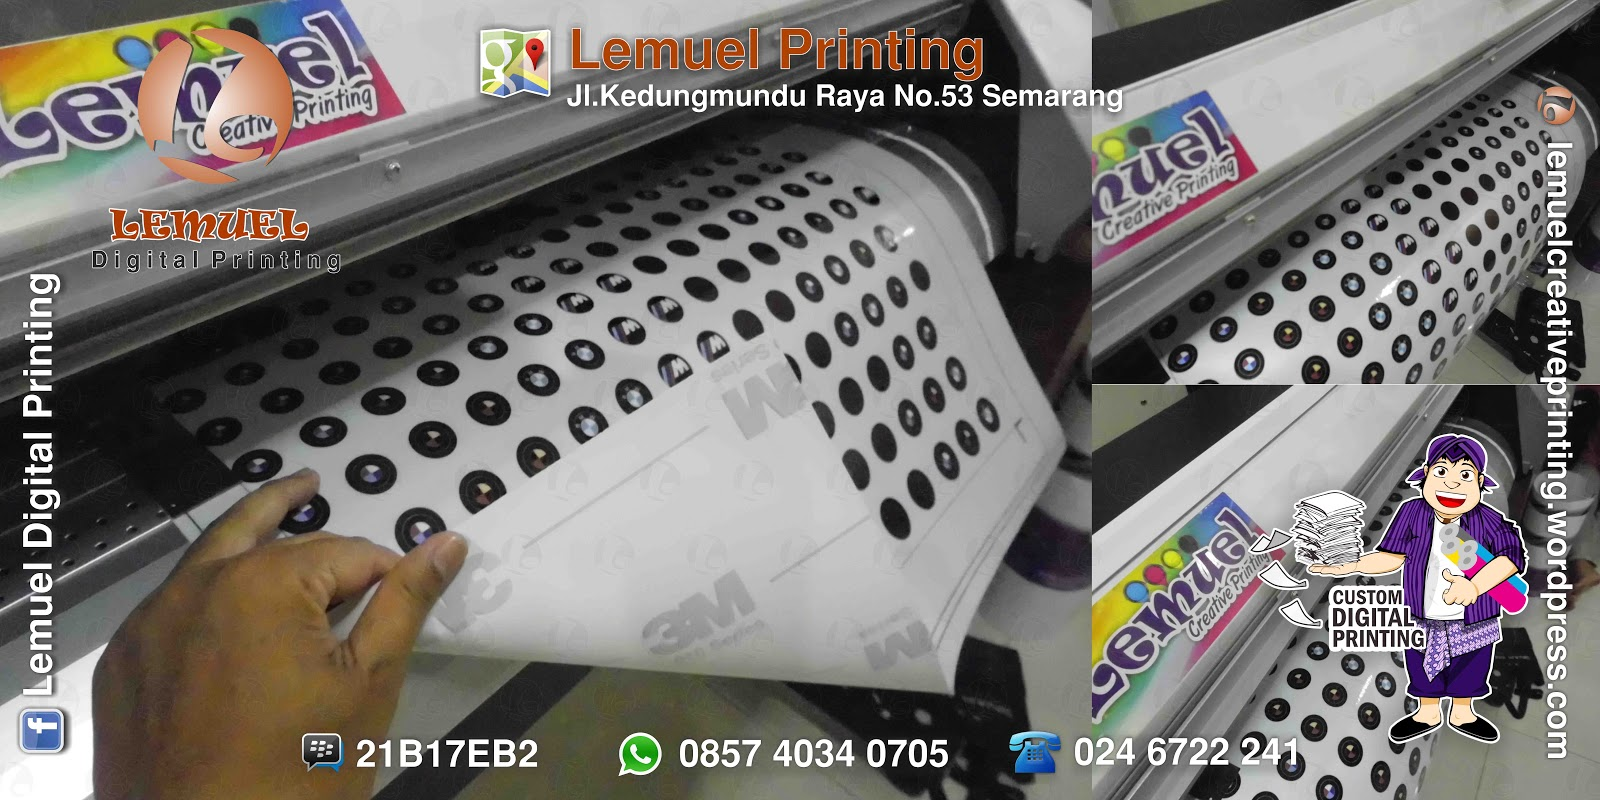 3M Sticker Printing